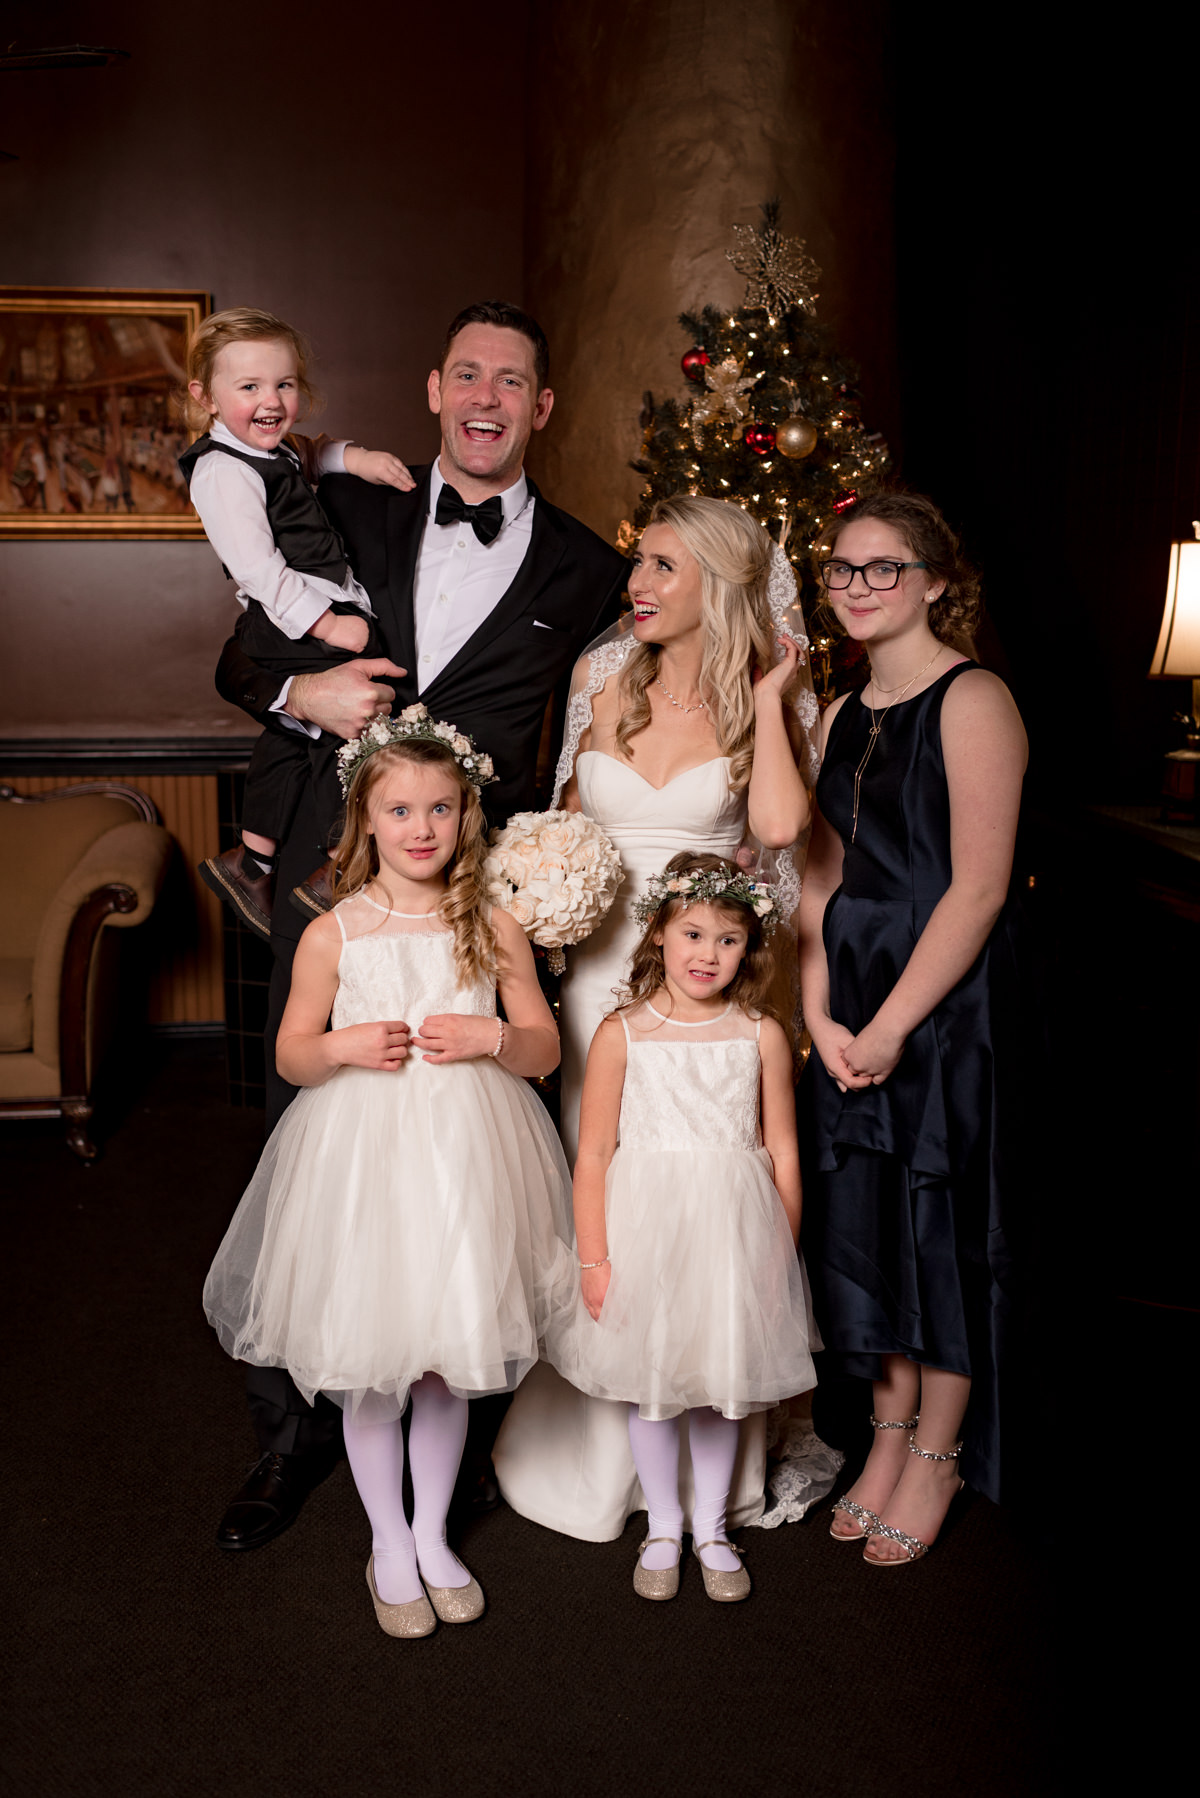 Andrew Tat - Documentary Wedding Photography - Lake Union Cafe - Seattle, Washington -Rachel and Ryan - 28.jpg